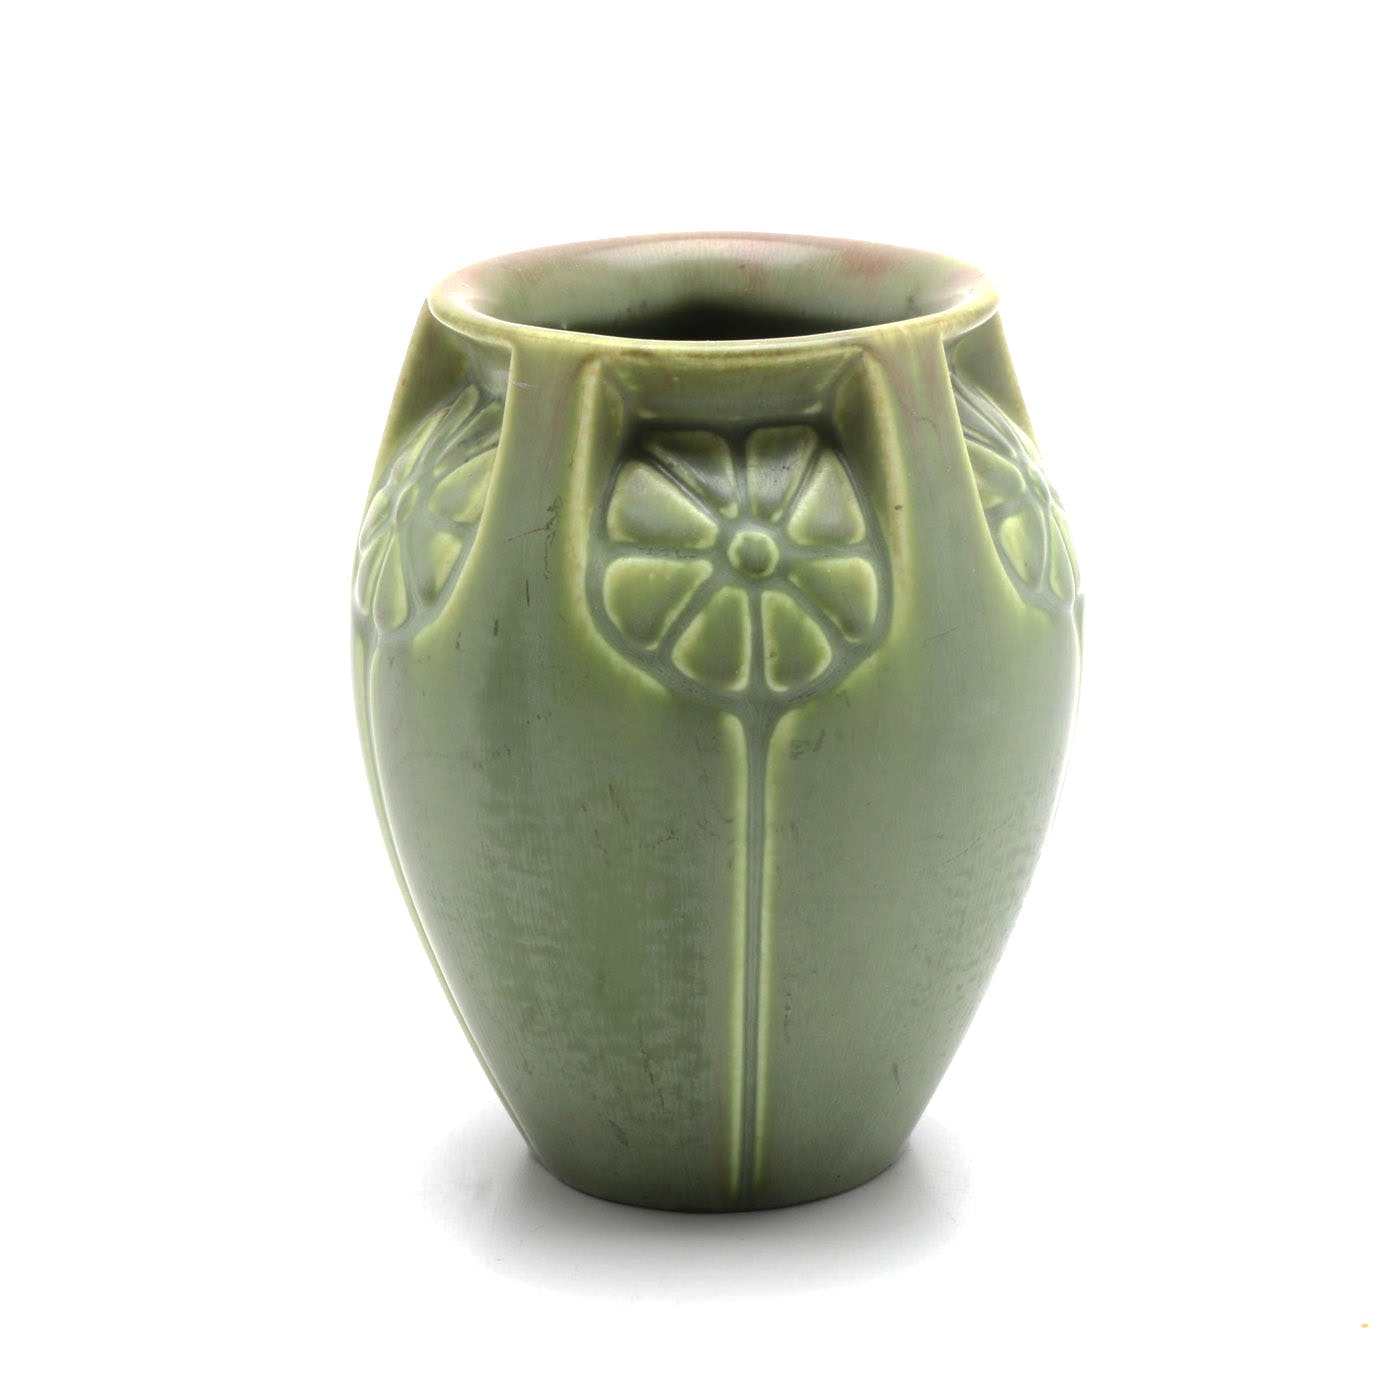 1938 Rookwood Pottery Vase